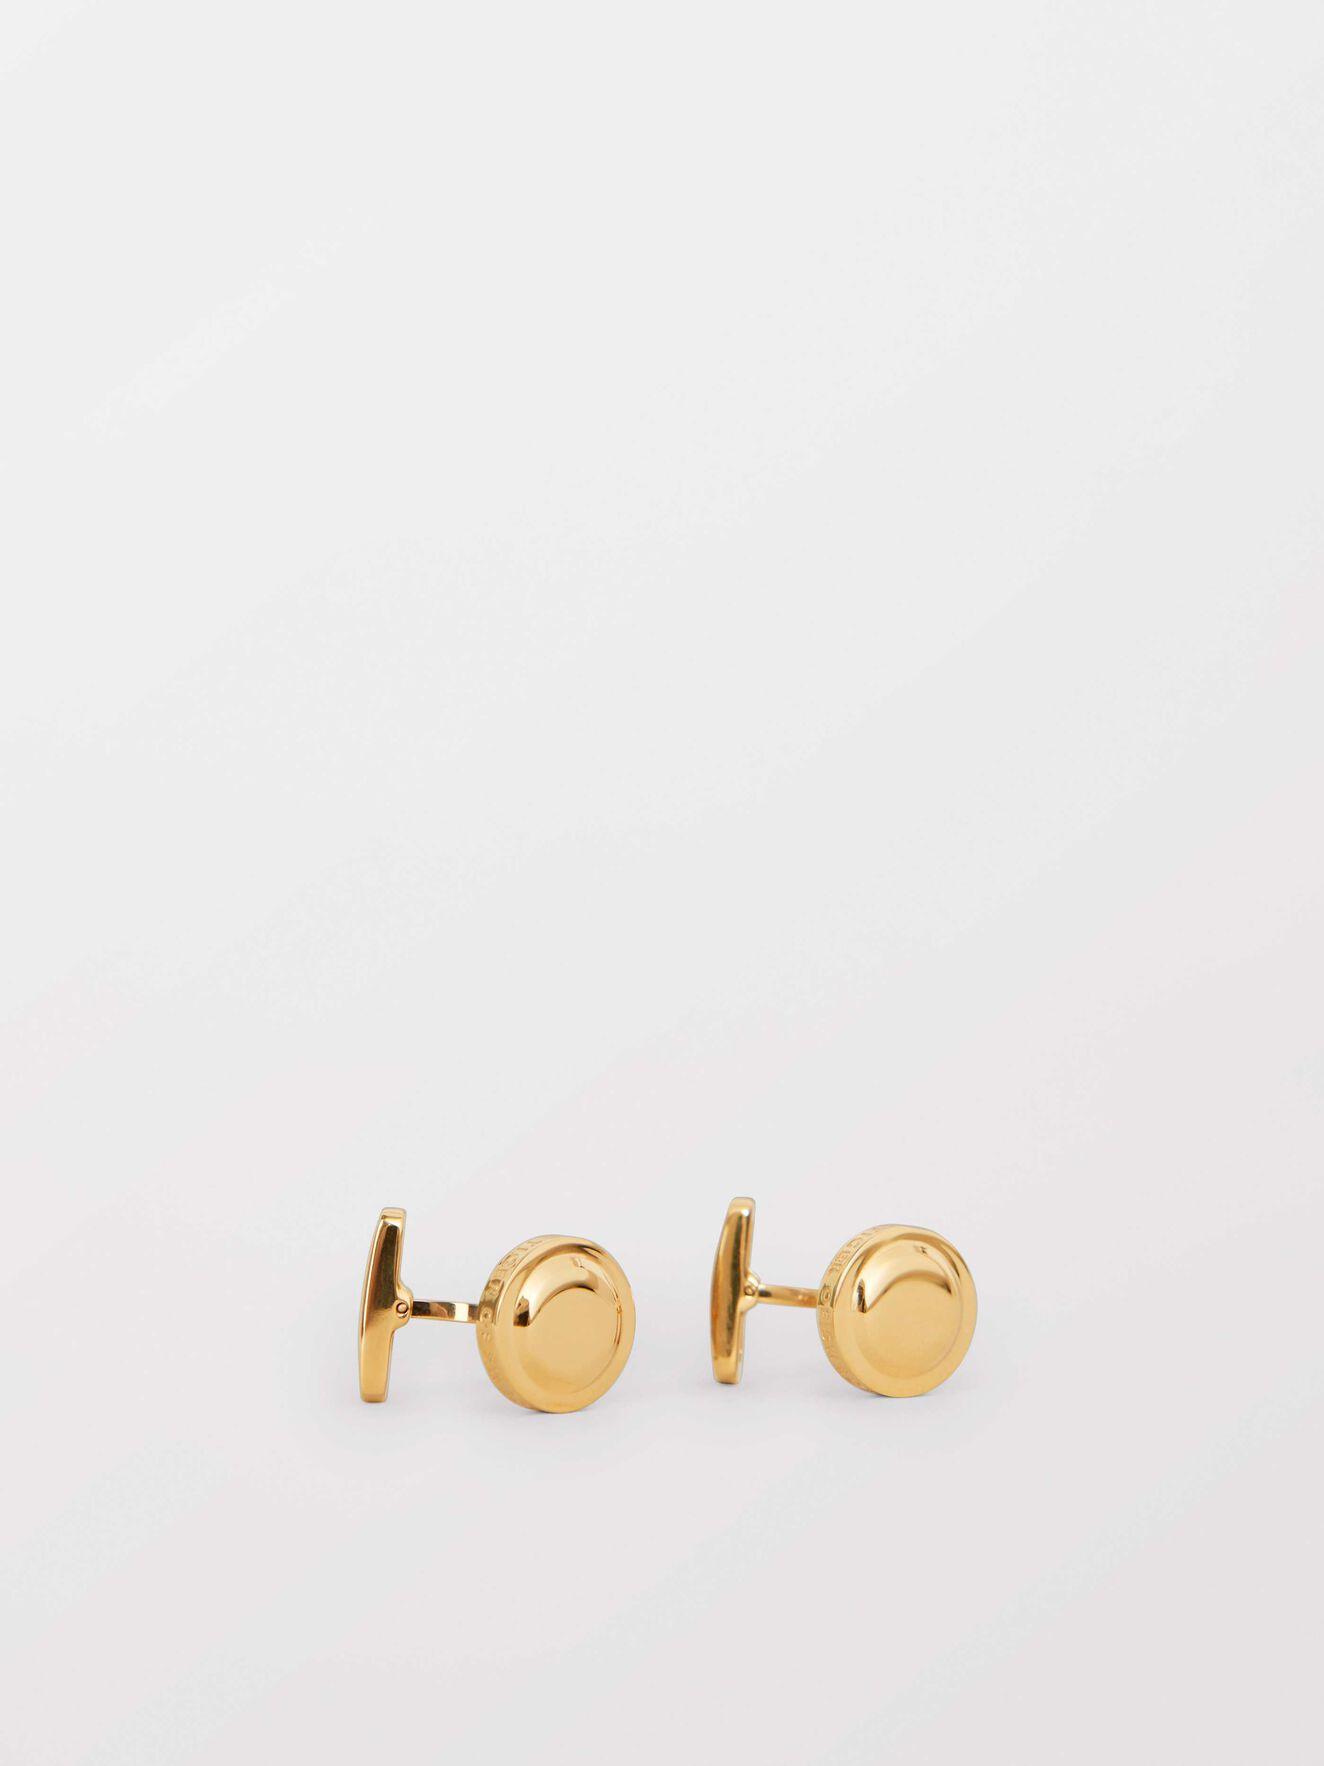 Kollett Cufflinks in Gold from Tiger of Sweden